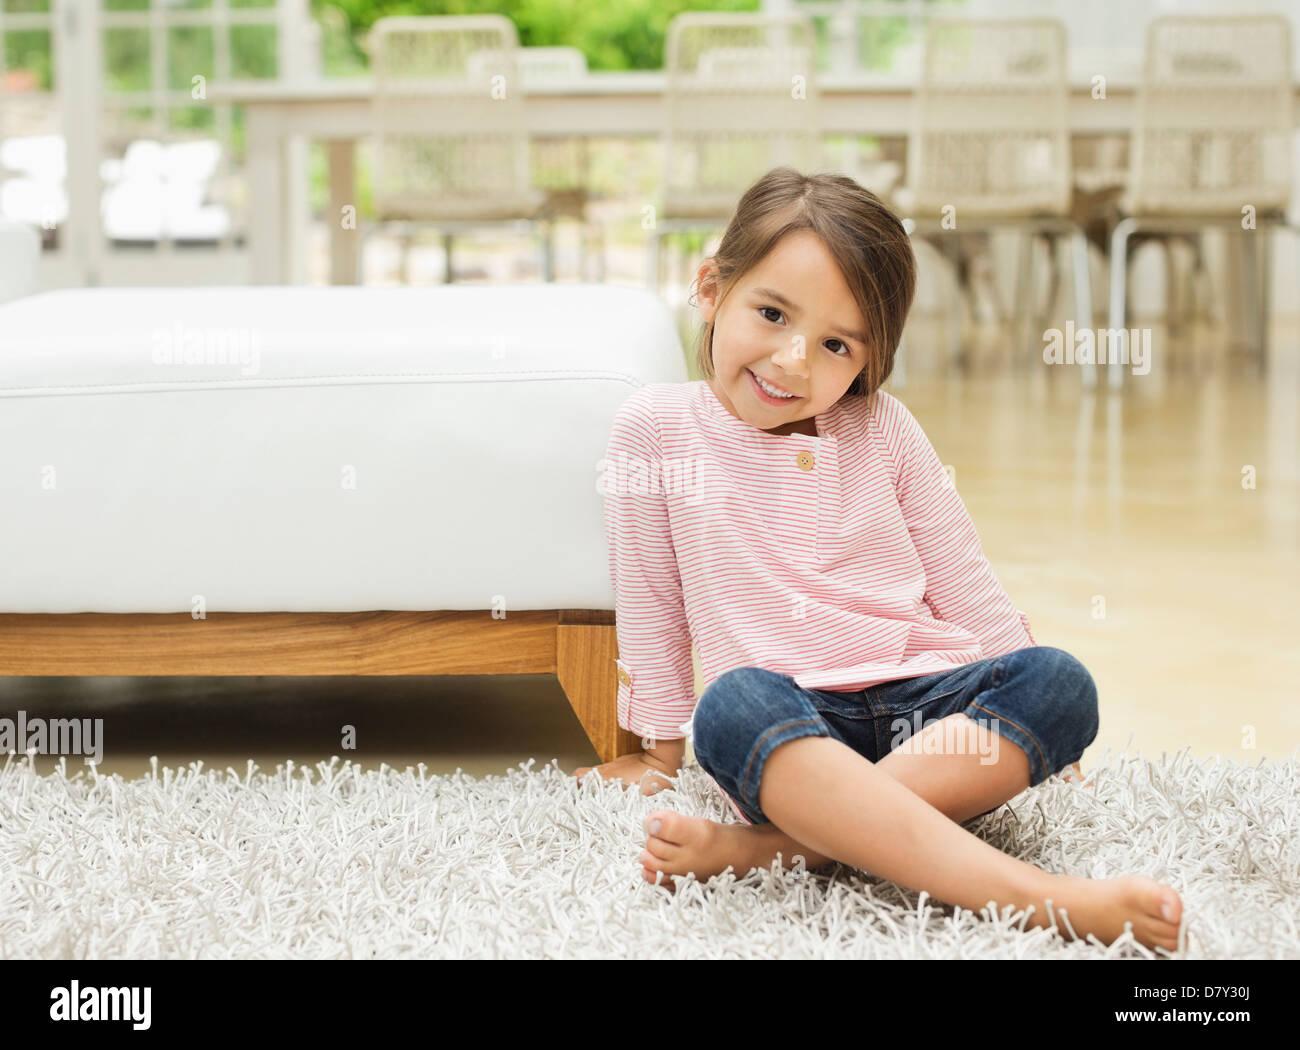 Smiling girl sitting on rug - Stock Image